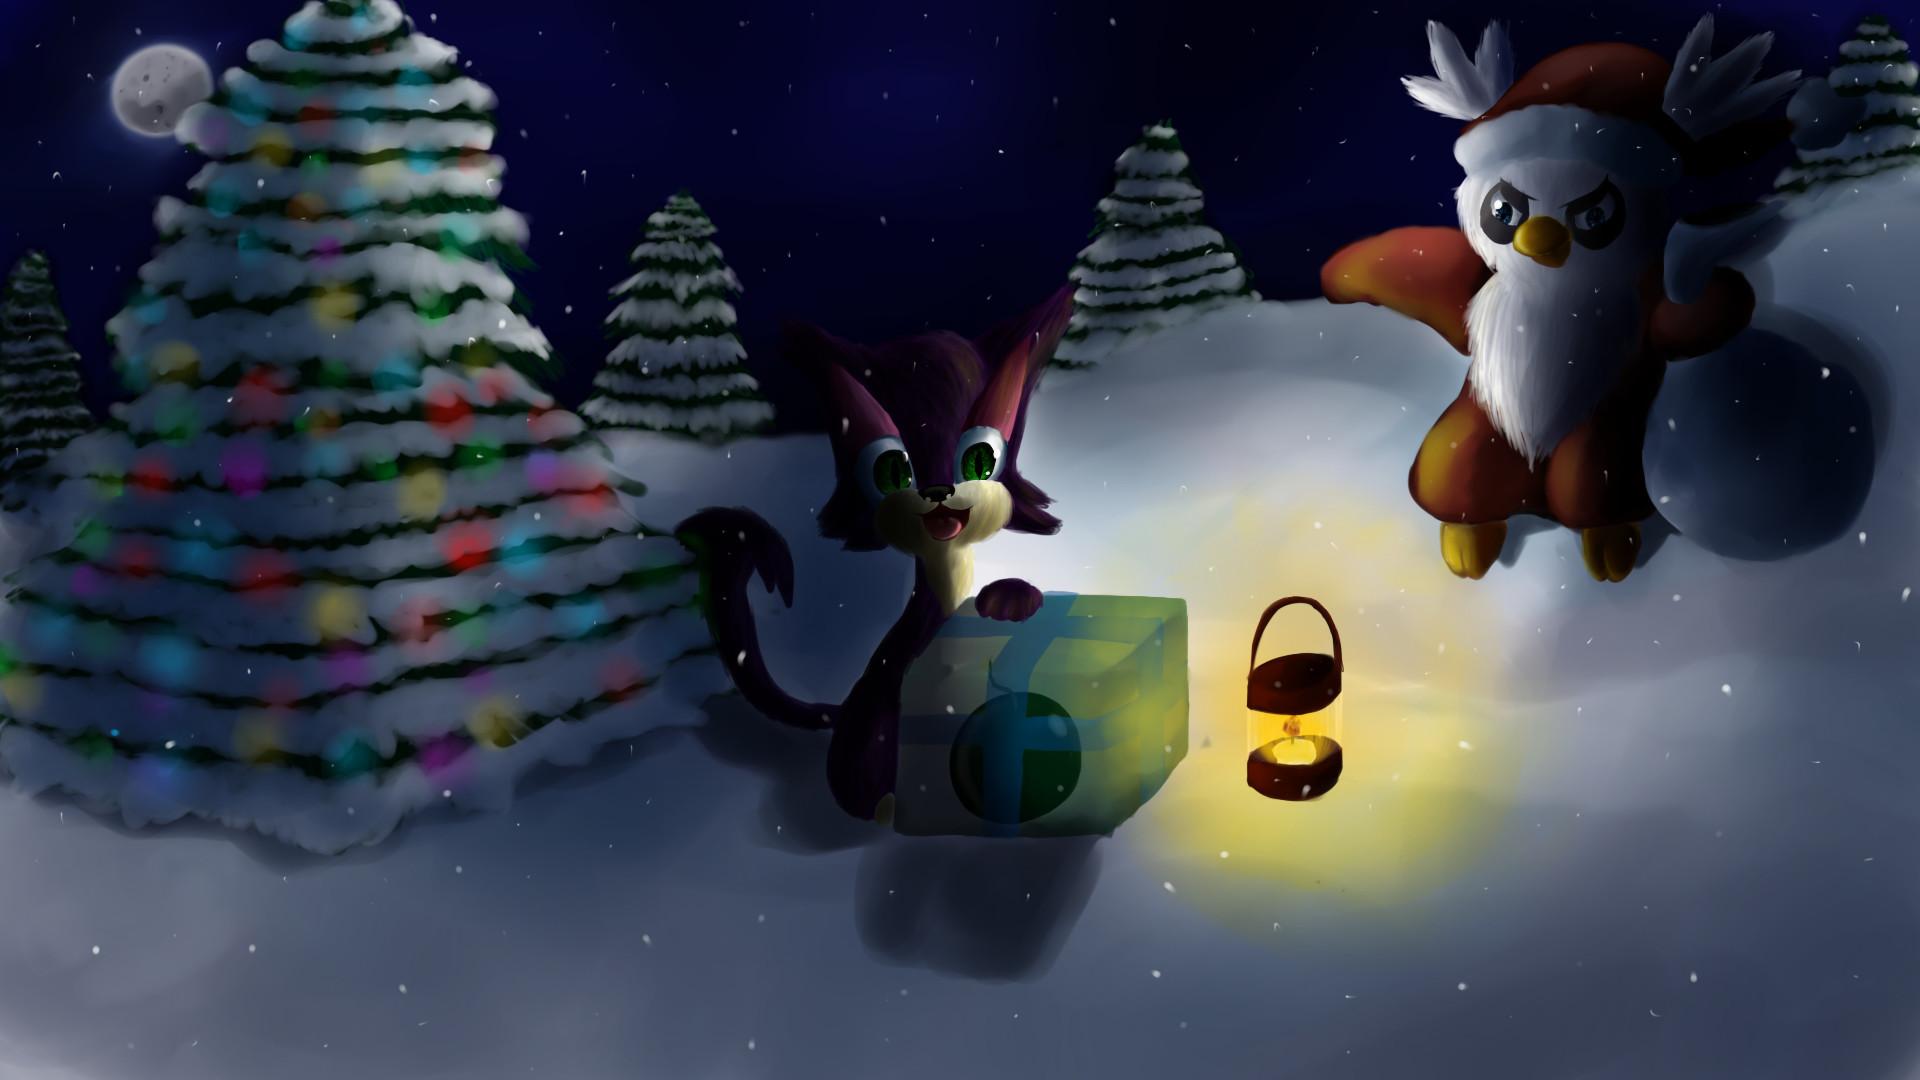 … Bad Santa ~Christmas Pokemon Wallpaper~ by Chicorii